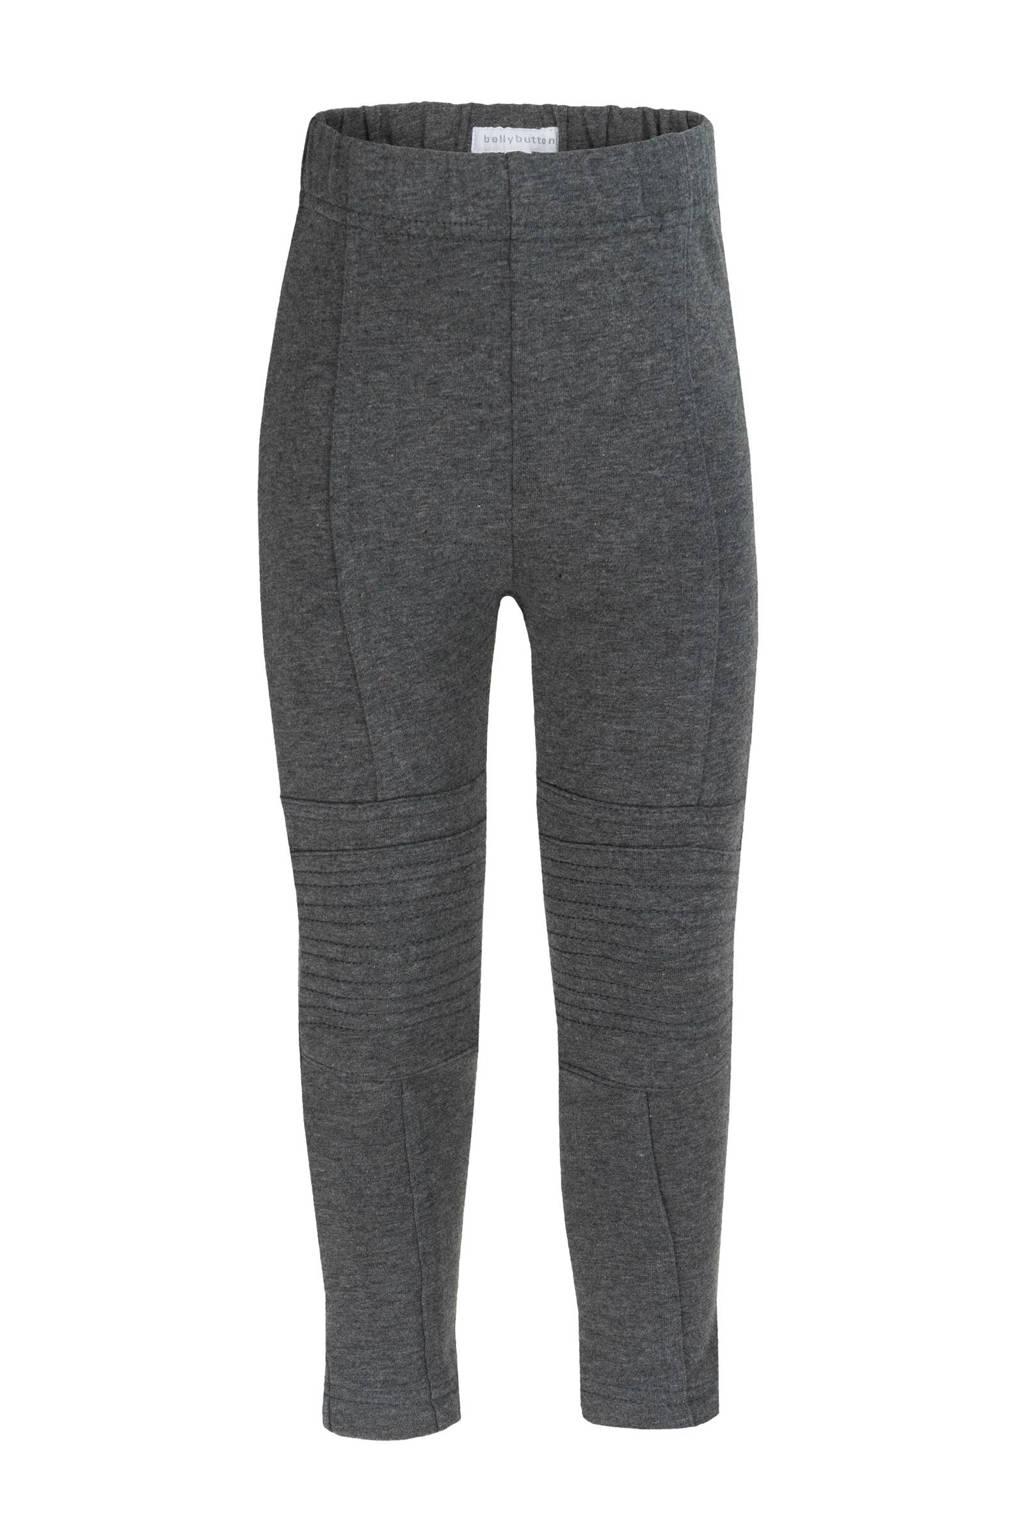 bellybutton legging grijs, Antraciet melange